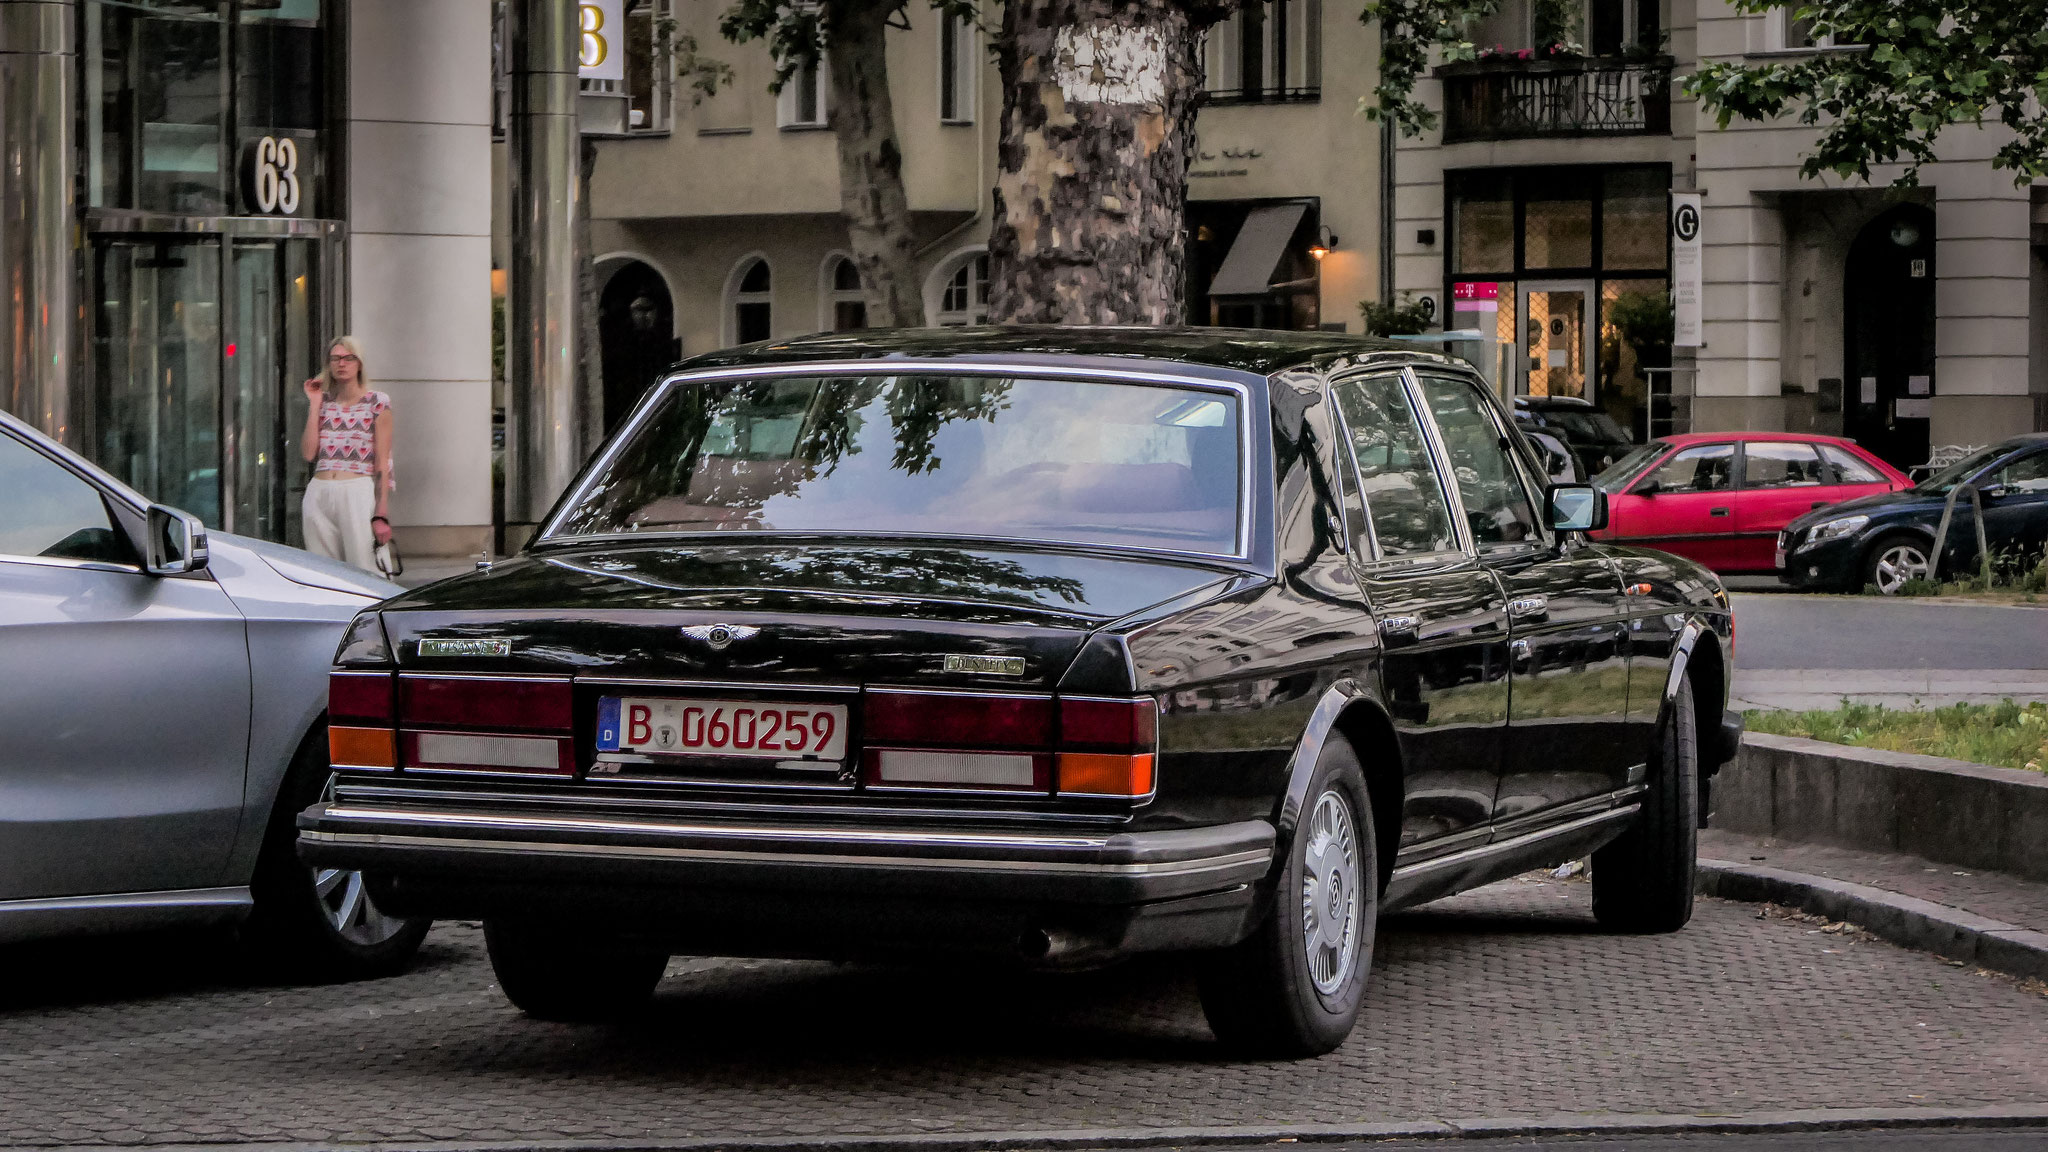 Bentley Mulsanne - B-060259